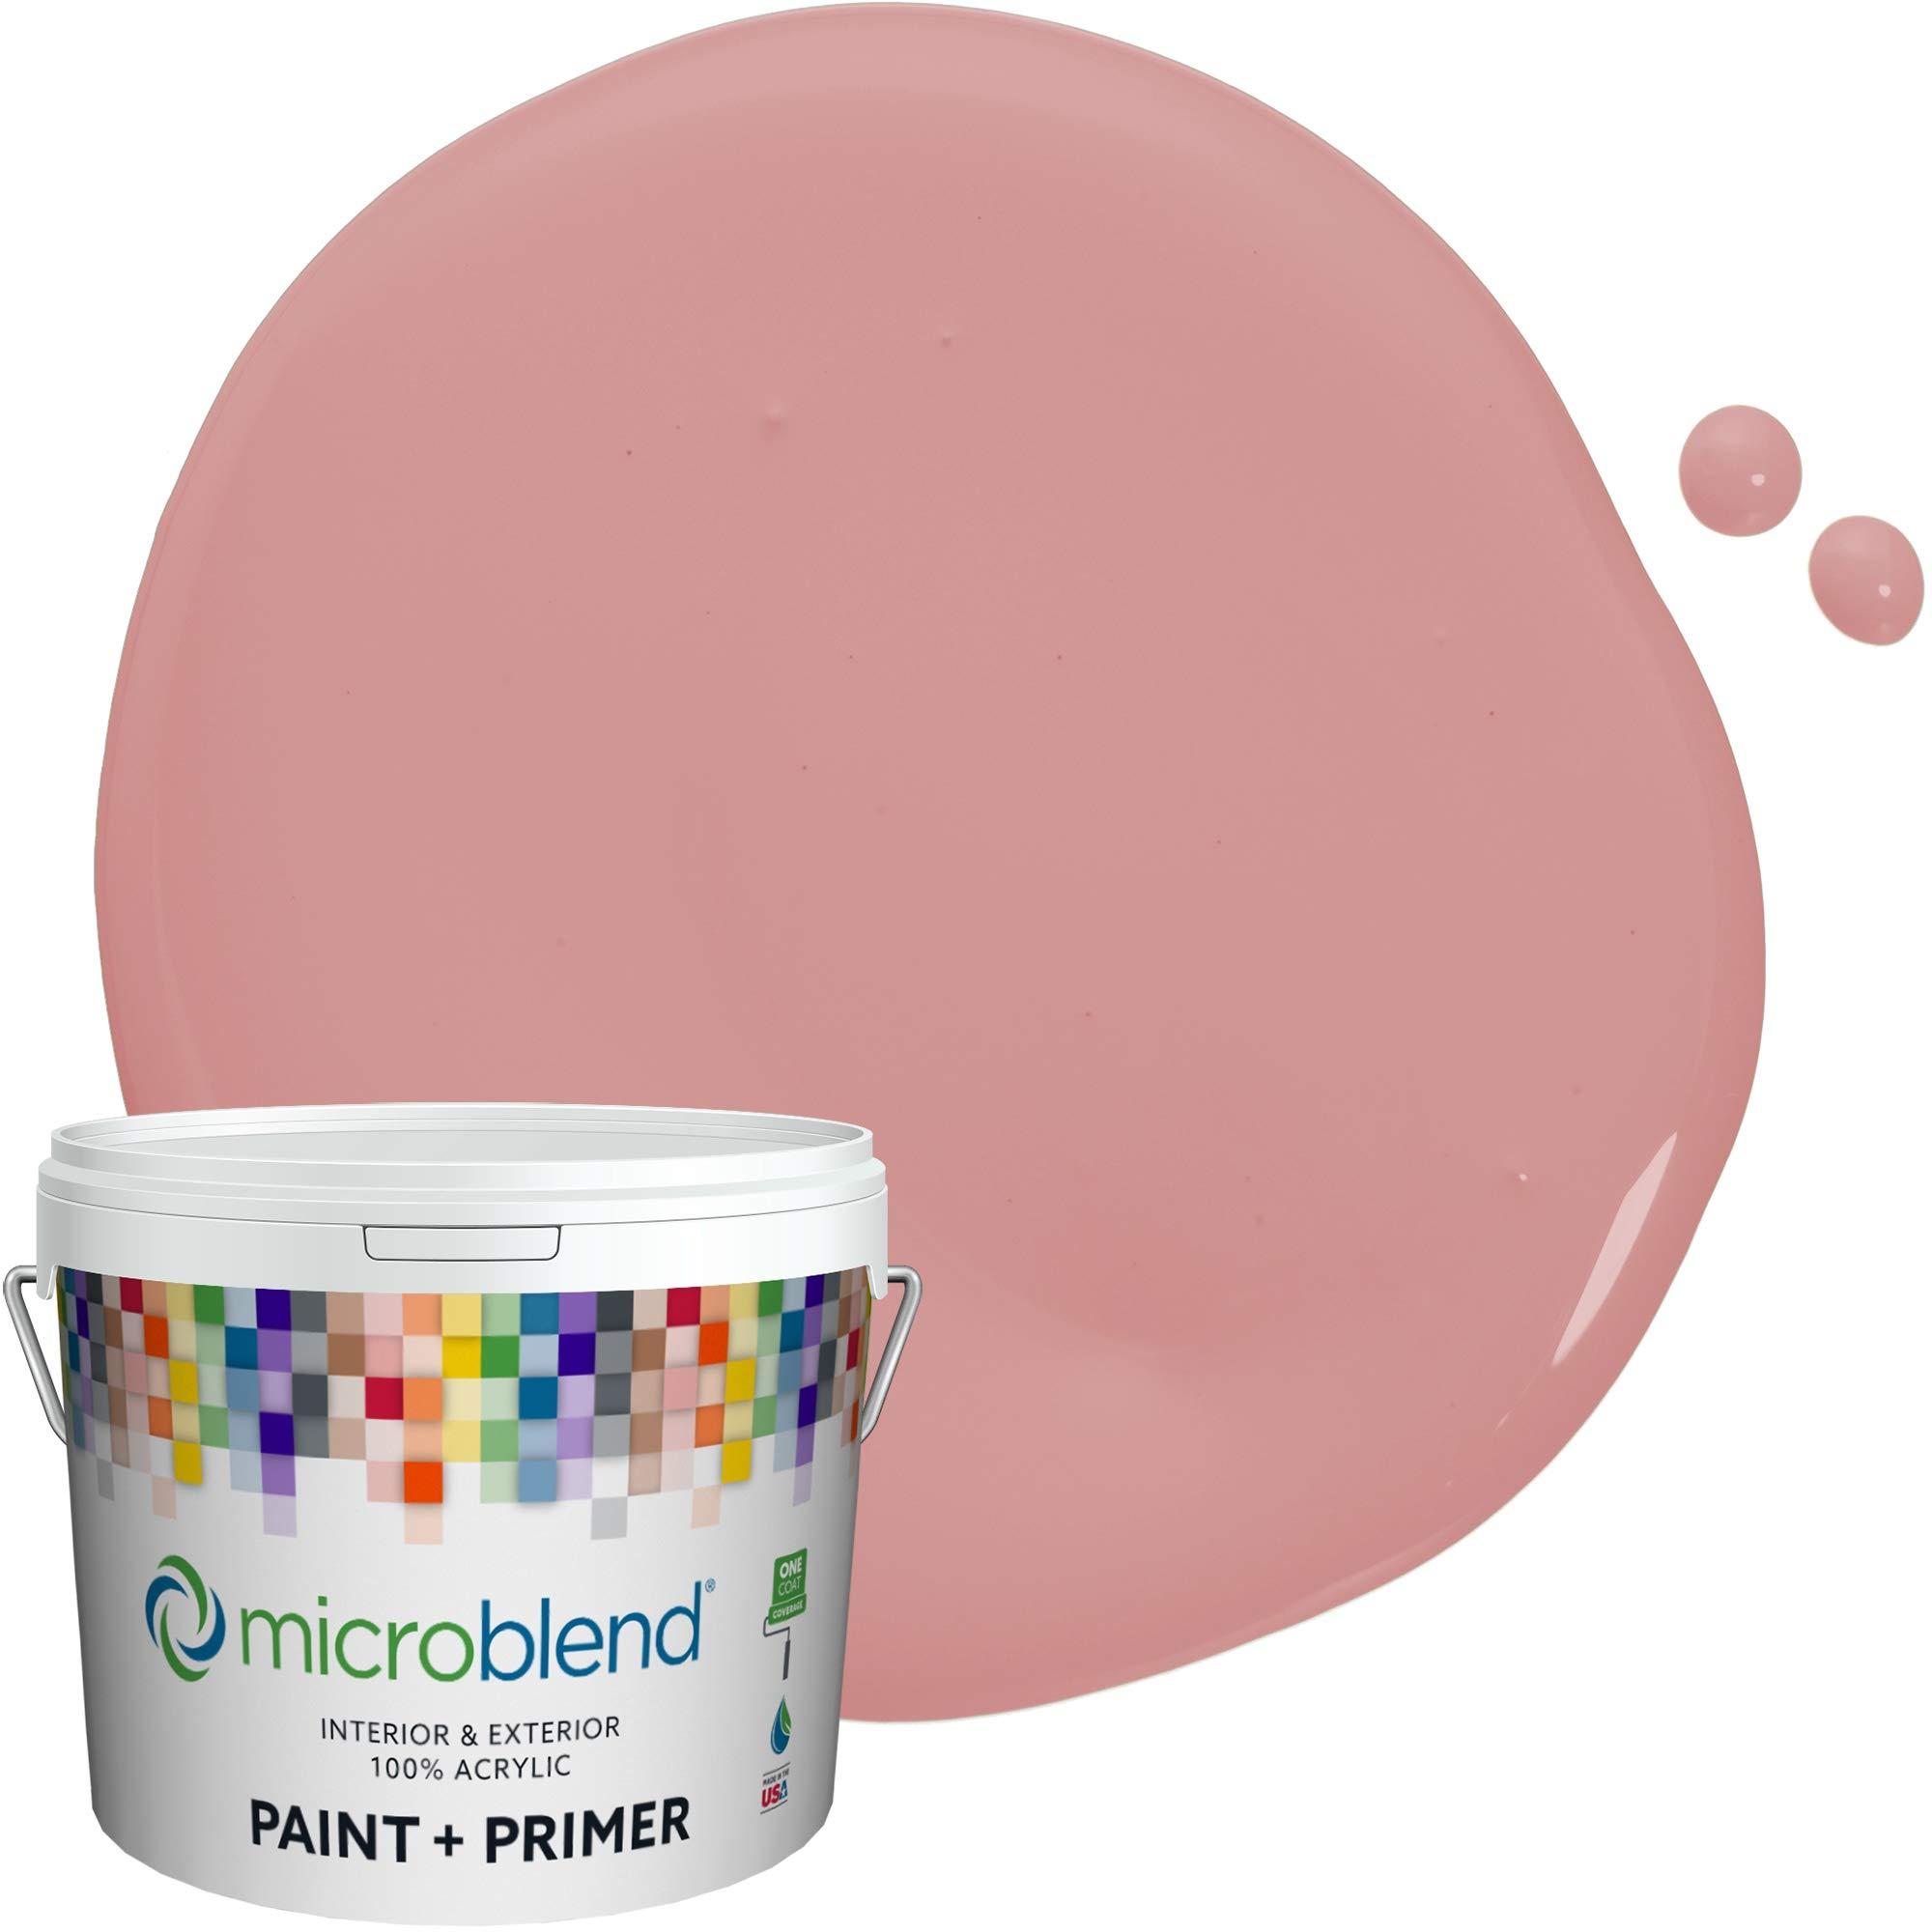 MicroBlend Interior Paint + Primer, Little Regina, Eggshell Sheen, 1 Gallon, Custom Made, Premium Quality One Coat Hide & Washable Paint (73221-2-M1888B3)